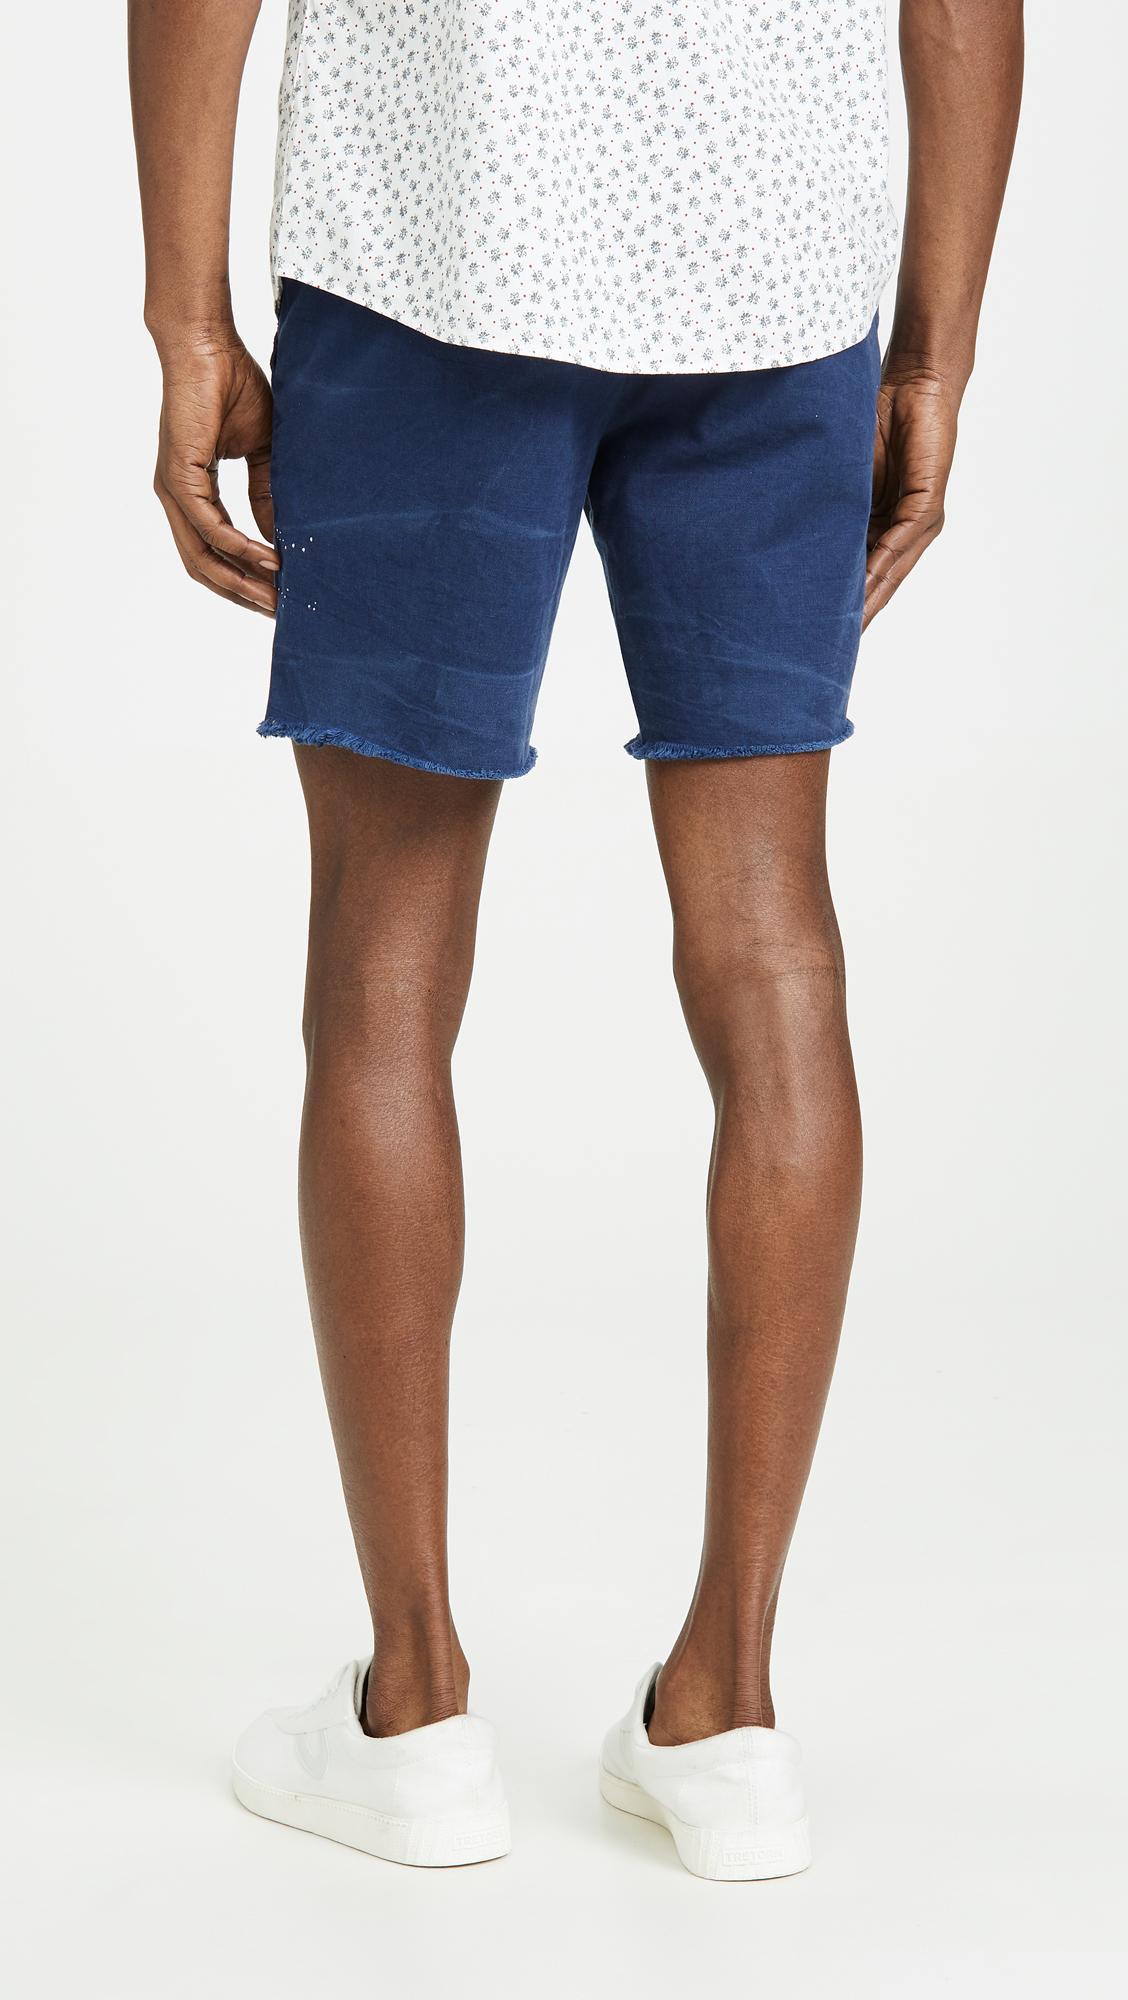 a15fc9ce2 Polo Ralph Lauren - Blue Montauk Chino Shorts for Men - Lyst. View  fullscreen